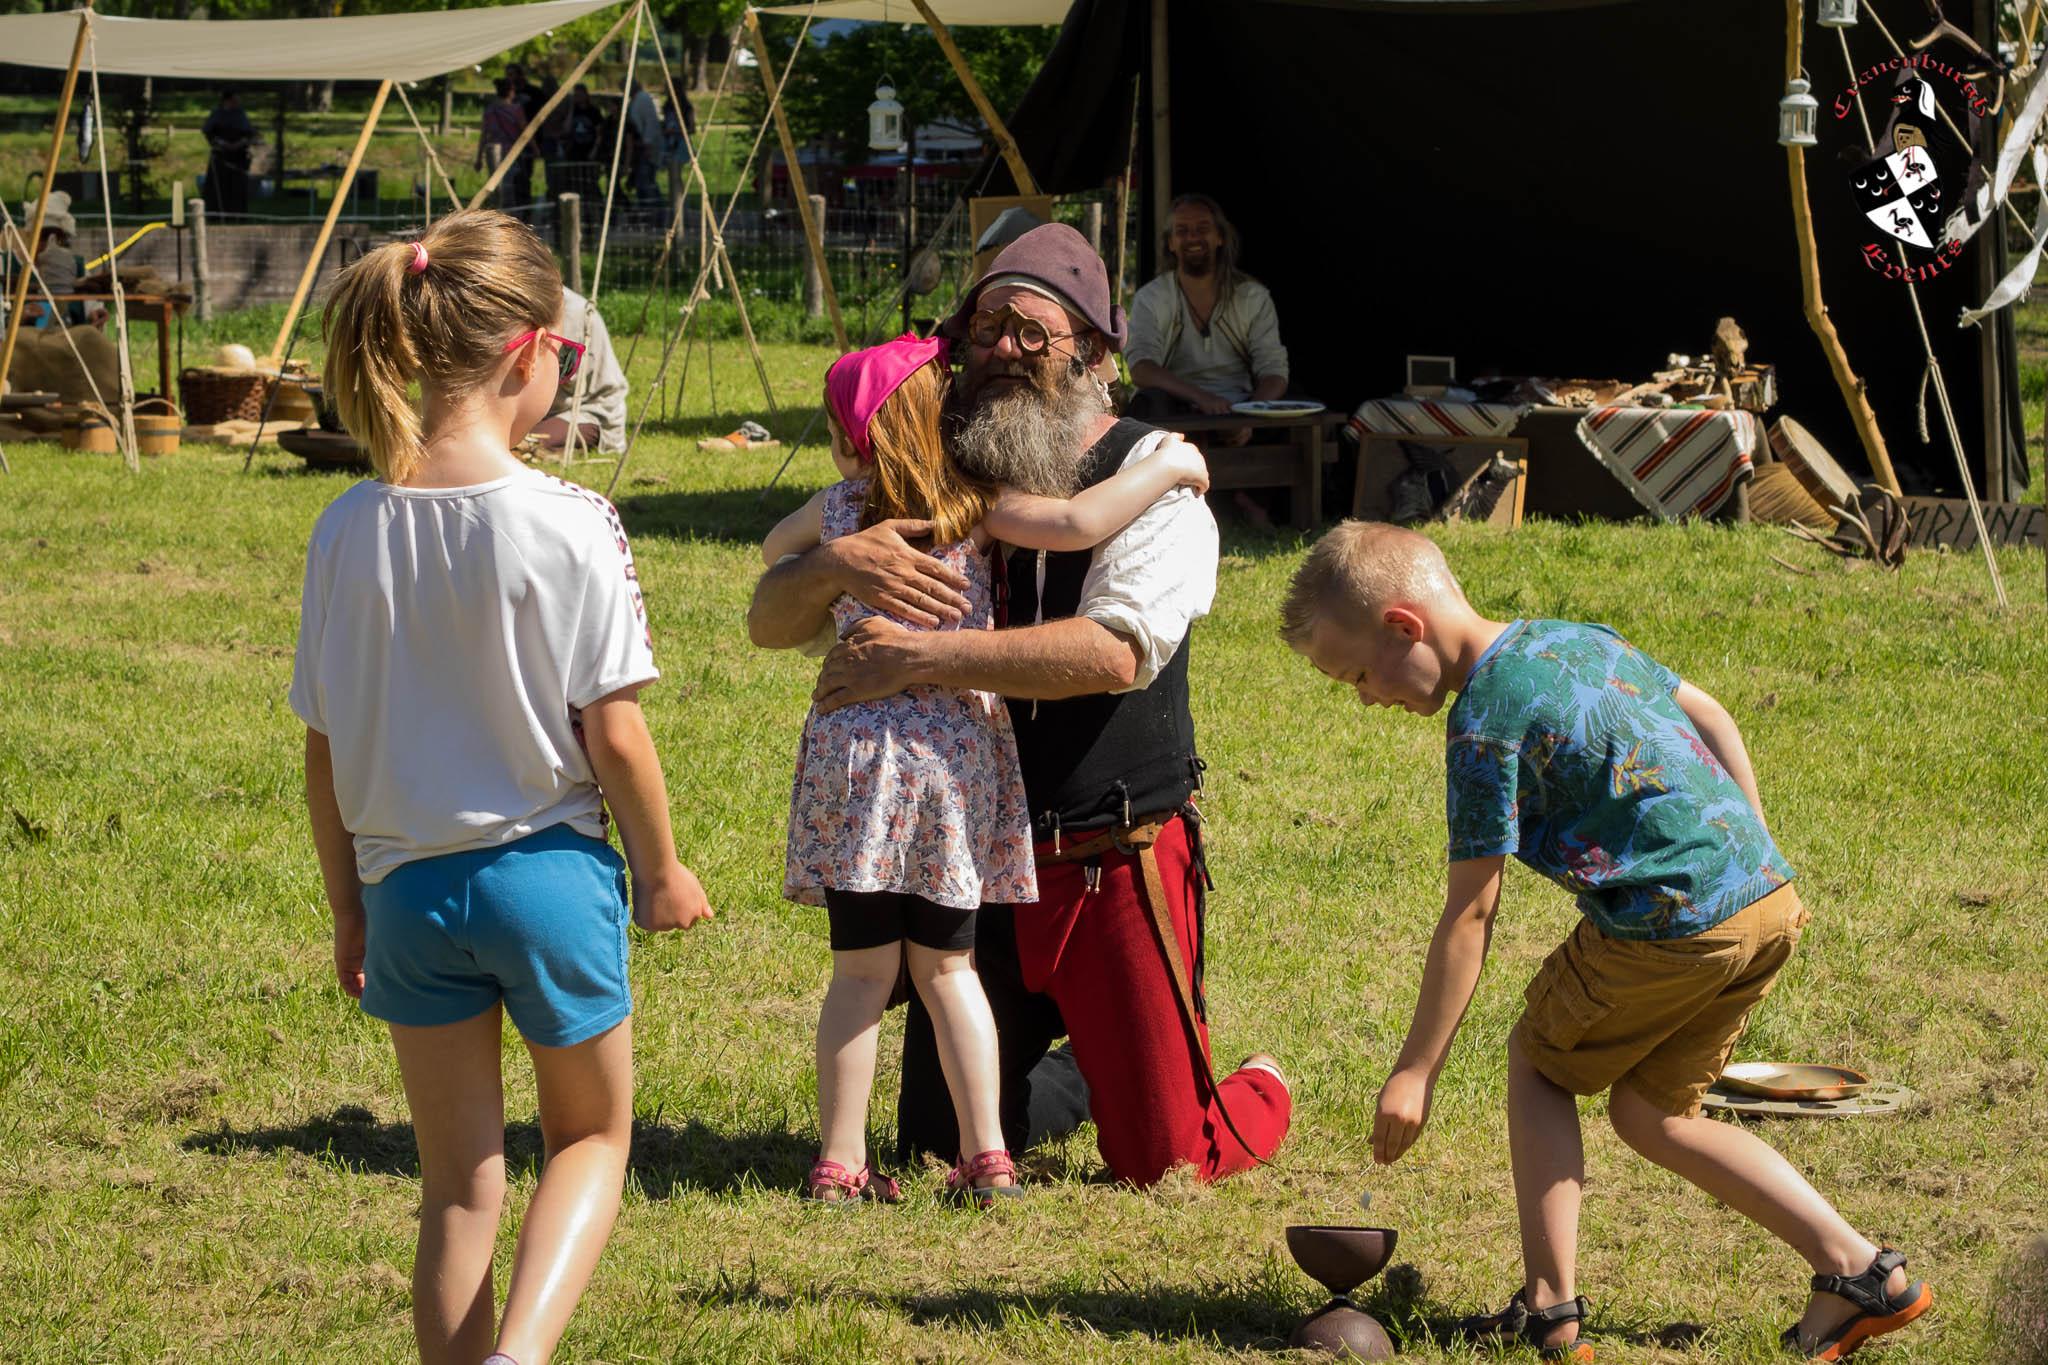 Middeleeuws-Festijn-Cannenburgh-2018-Algemeen-Ellen-la-Faille-24